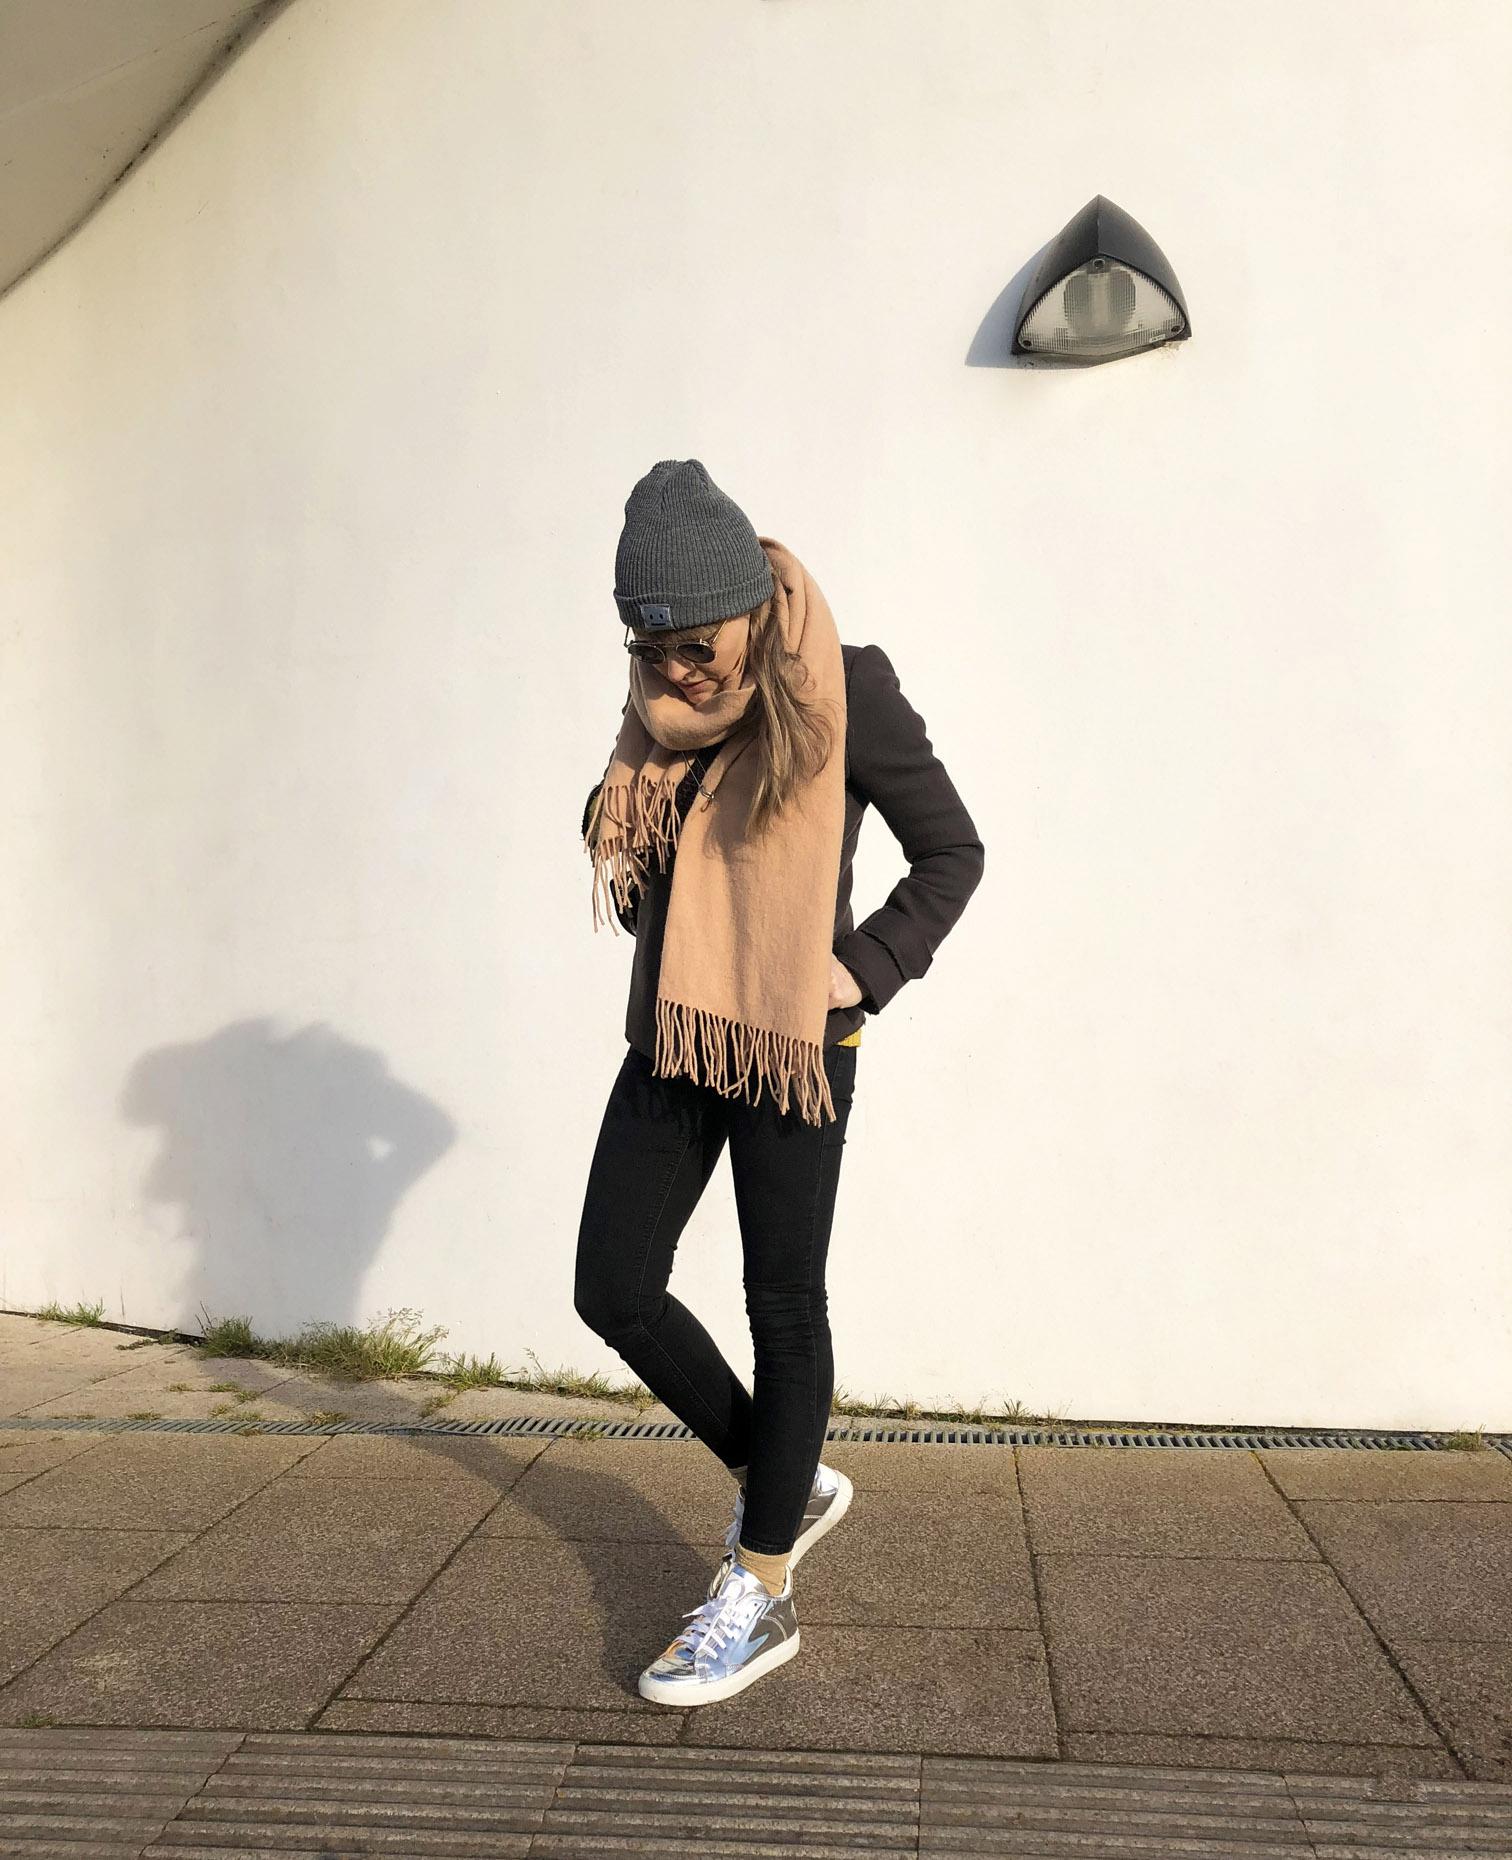 silver metallic shiny sneakers margiela mm6 chylak saddle bag acne studios jil sander moscot zev by fashion art media